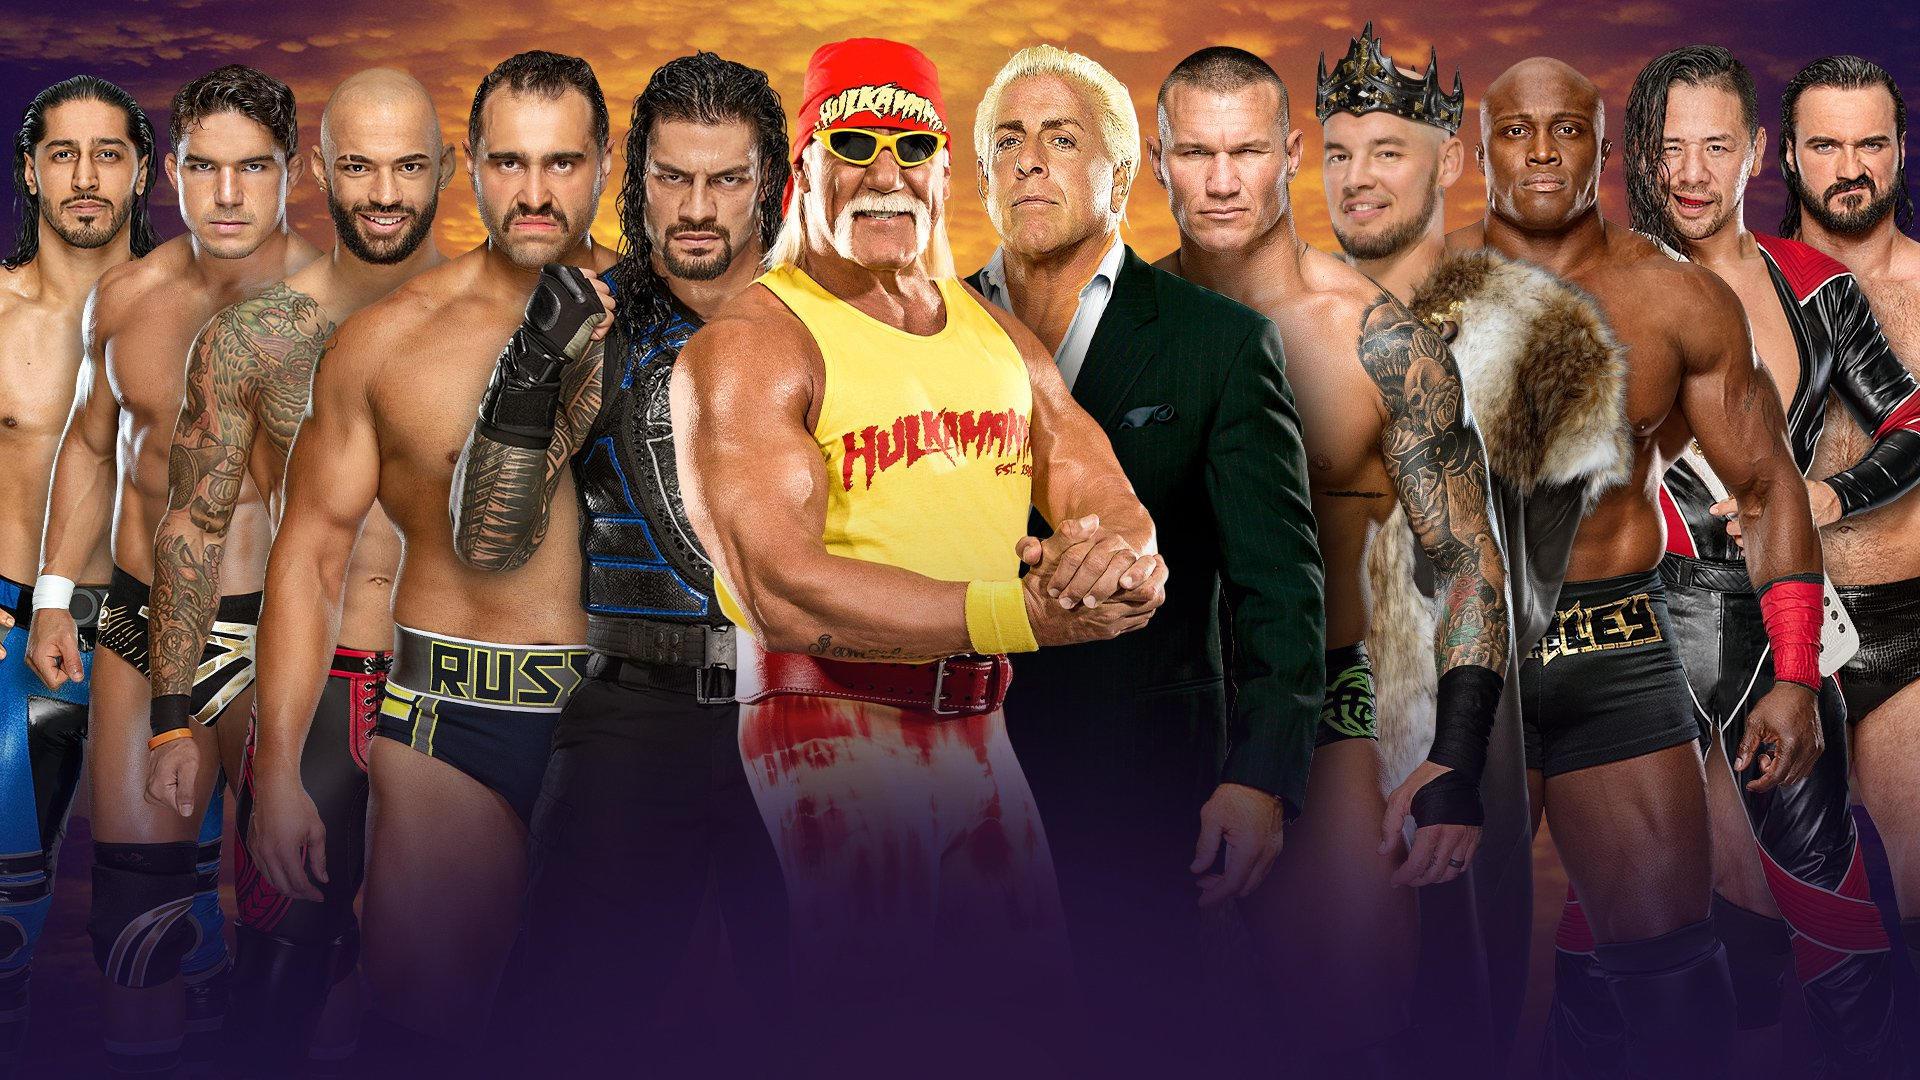 Team Hogan vs Team Flair